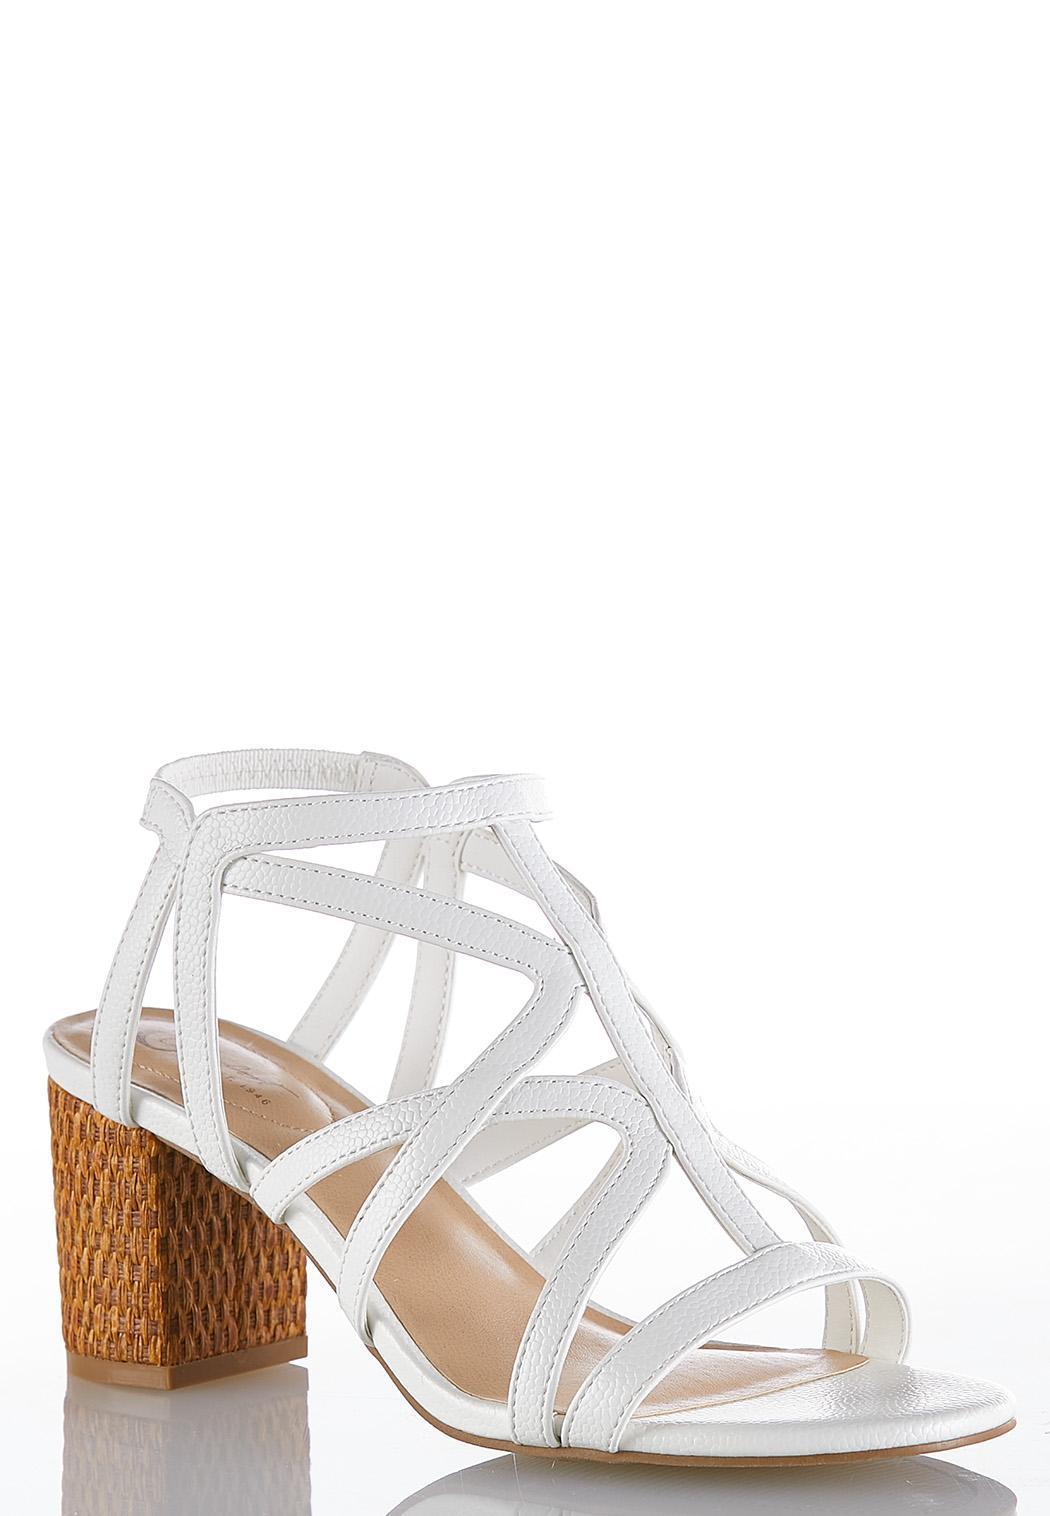 577259092ac2 Women s Sandals